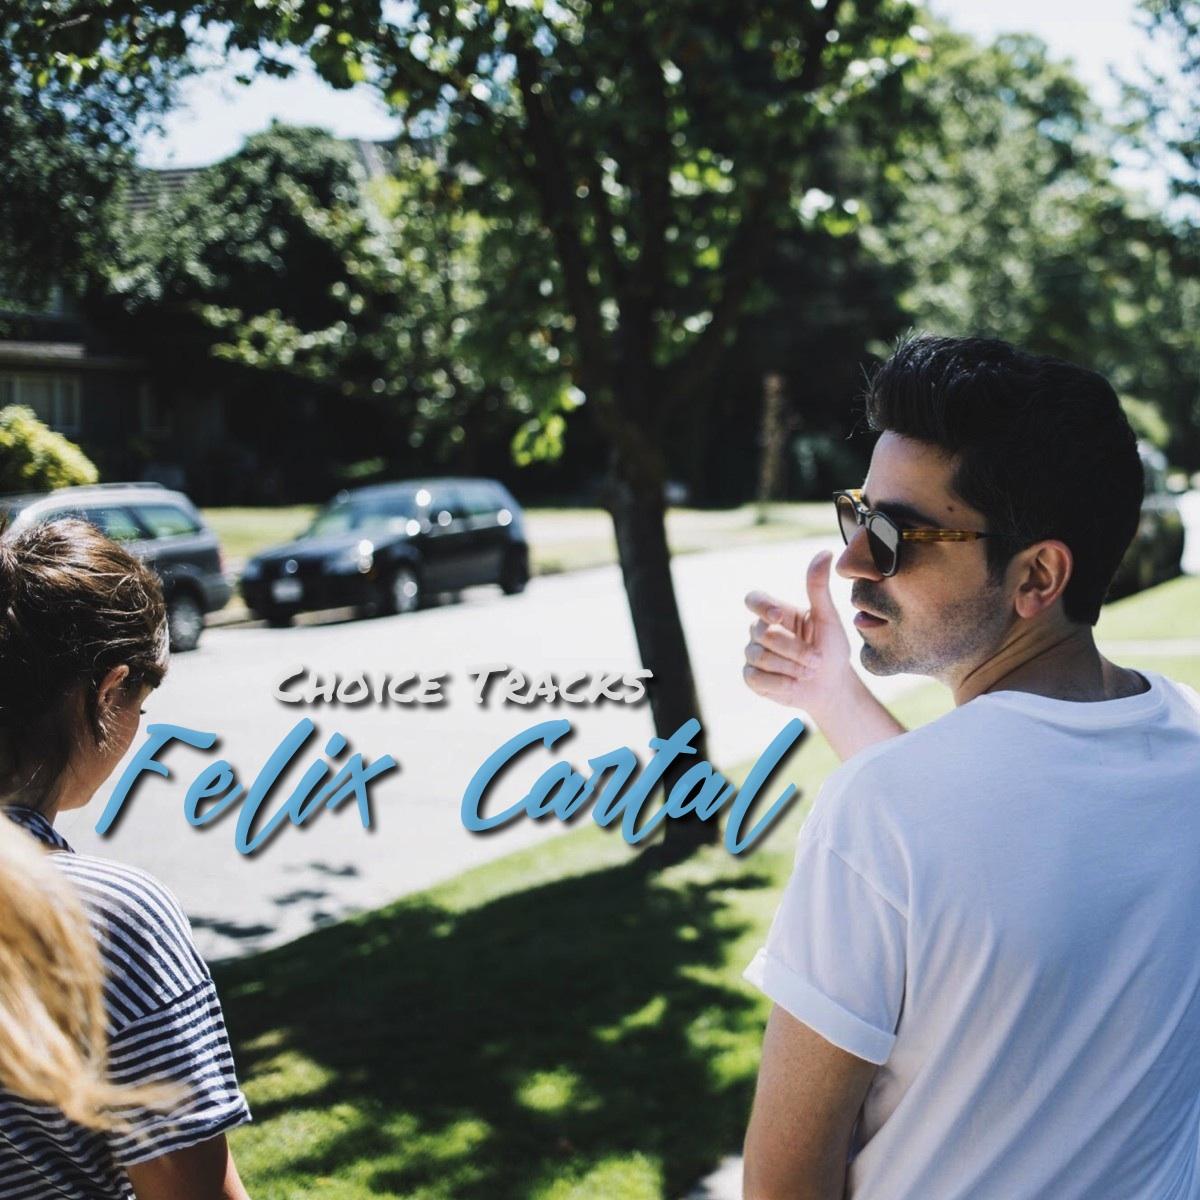 Felix Cartal Playlist Choice Tracks Summer